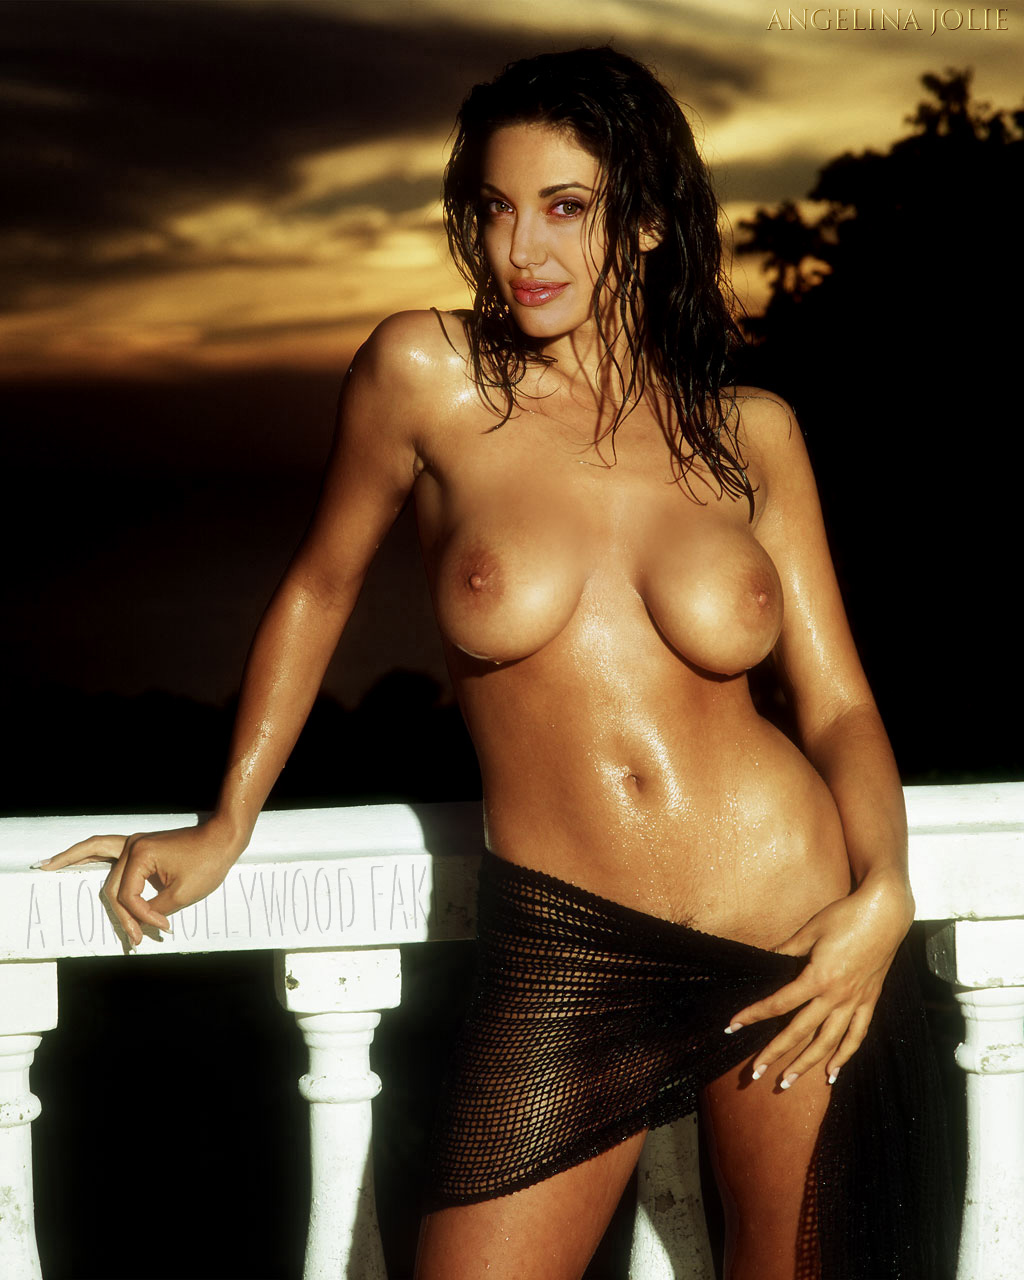 Naked angelina jolie nude